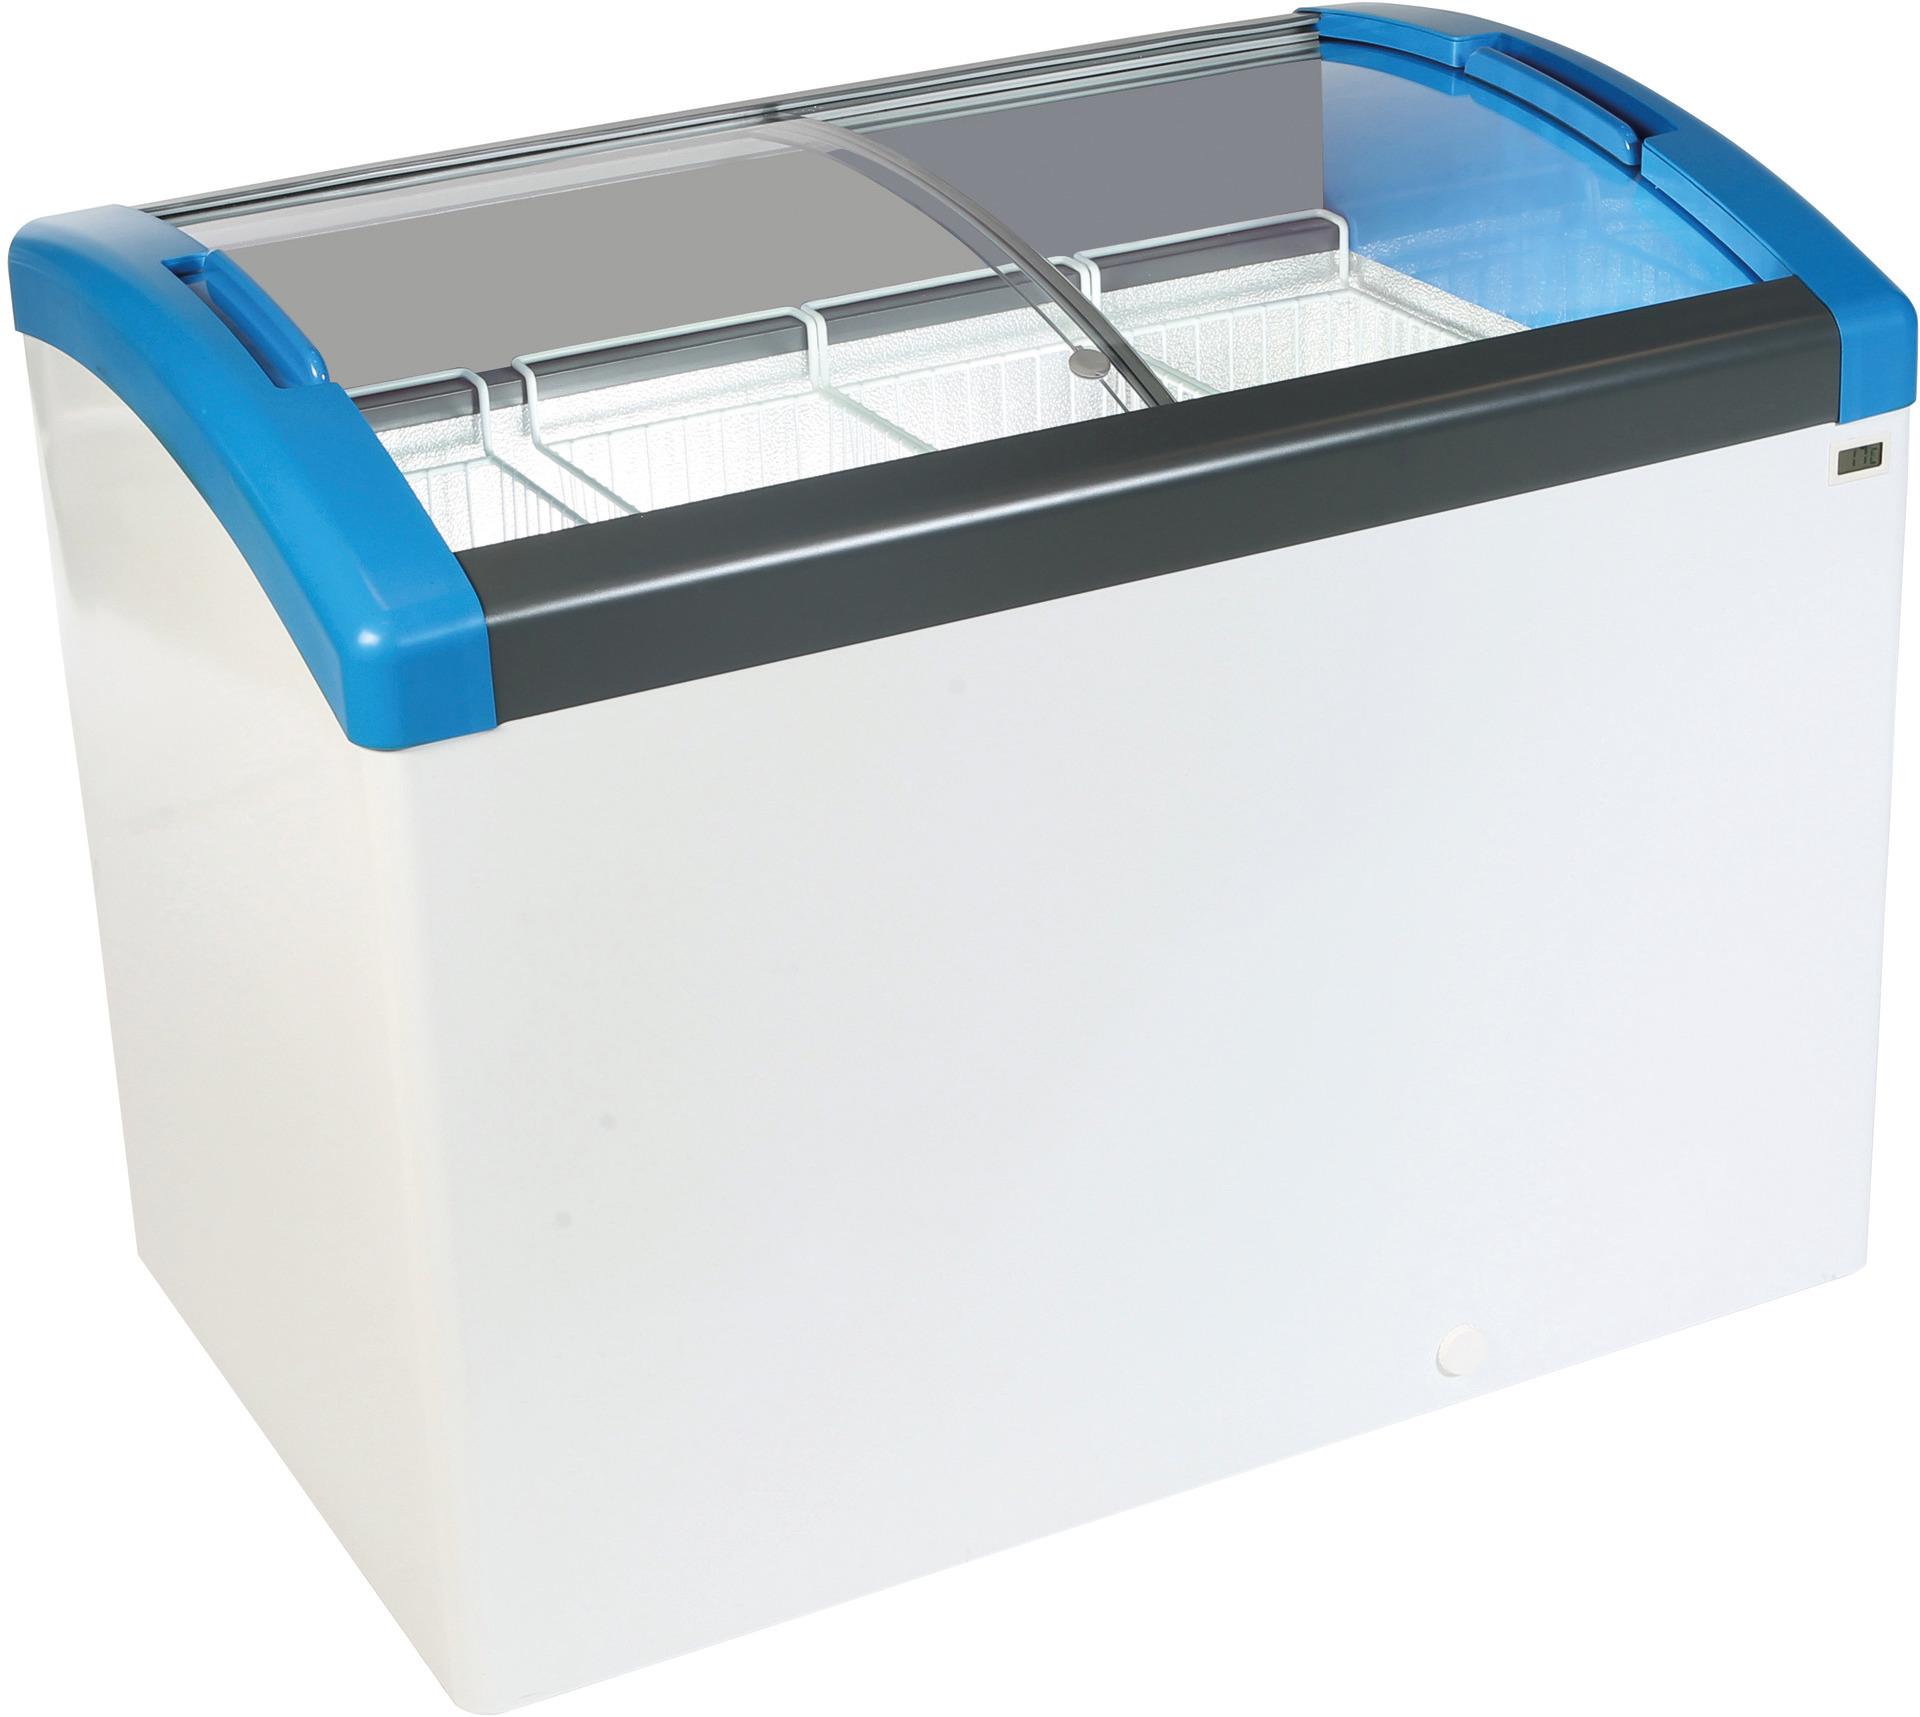 Kühl- / Tiefkühl-Impulstruhe 161,00 l  / für 3 Körbe / steckerfertig